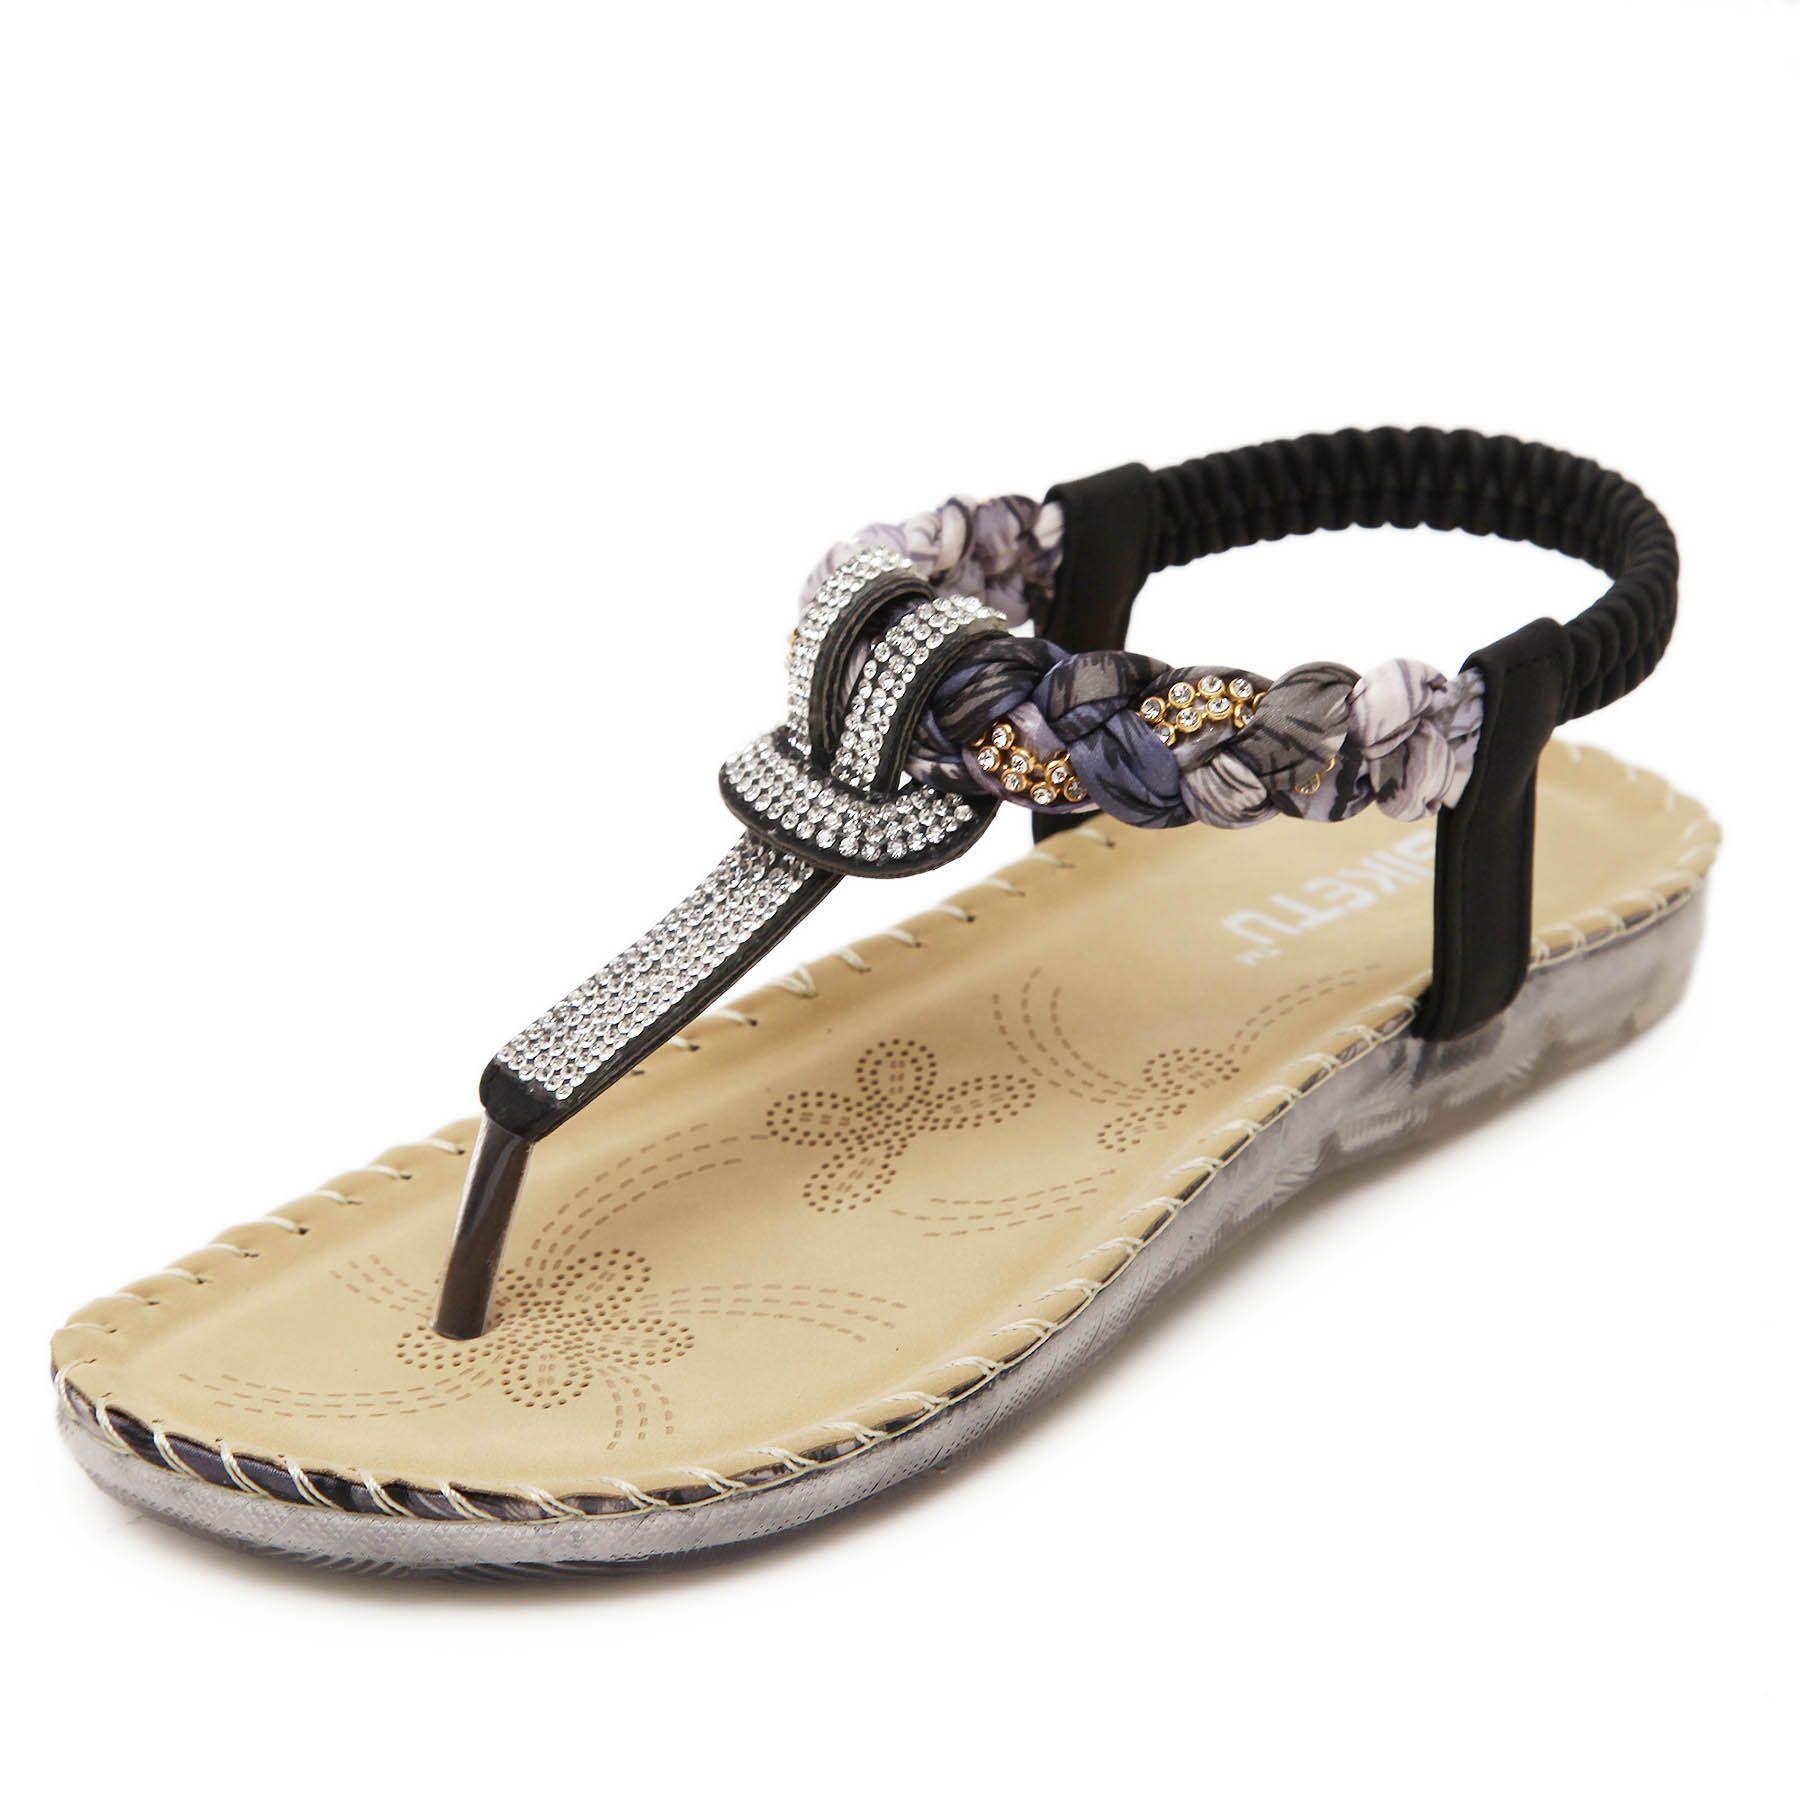 d0822f8fb299 SIKETU Vintage Ethnic Gladiator Sandal in 2019